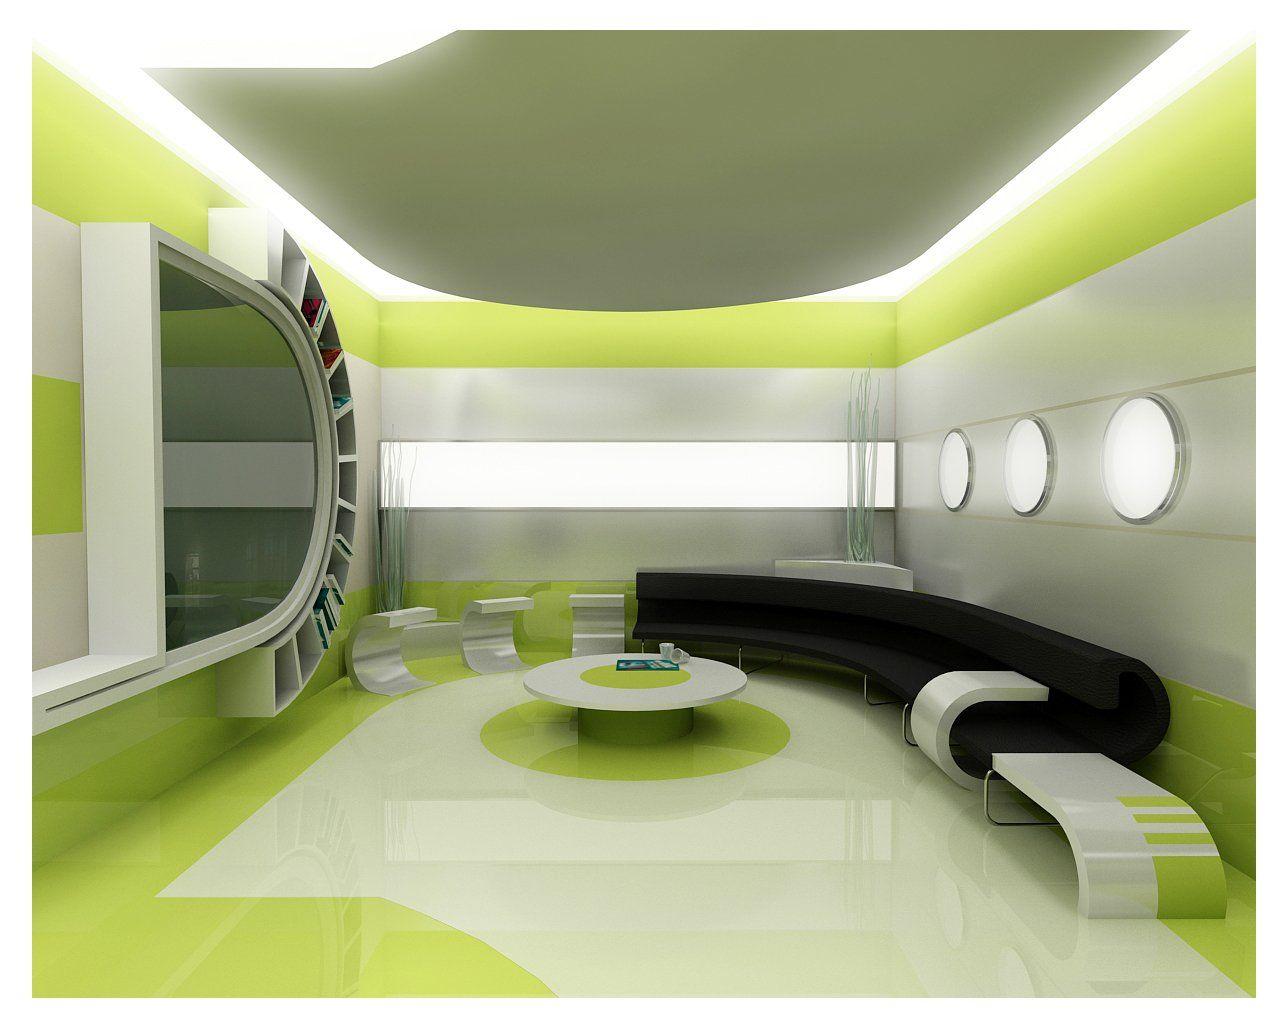 http://2.bp.blogspot.com/-CPf0aPk7yzM/T0JpnK_BYII/AAAAAAAAAEQ/W7N7nLu5J60/s1600/Cosmic-living-room-interior.jpg